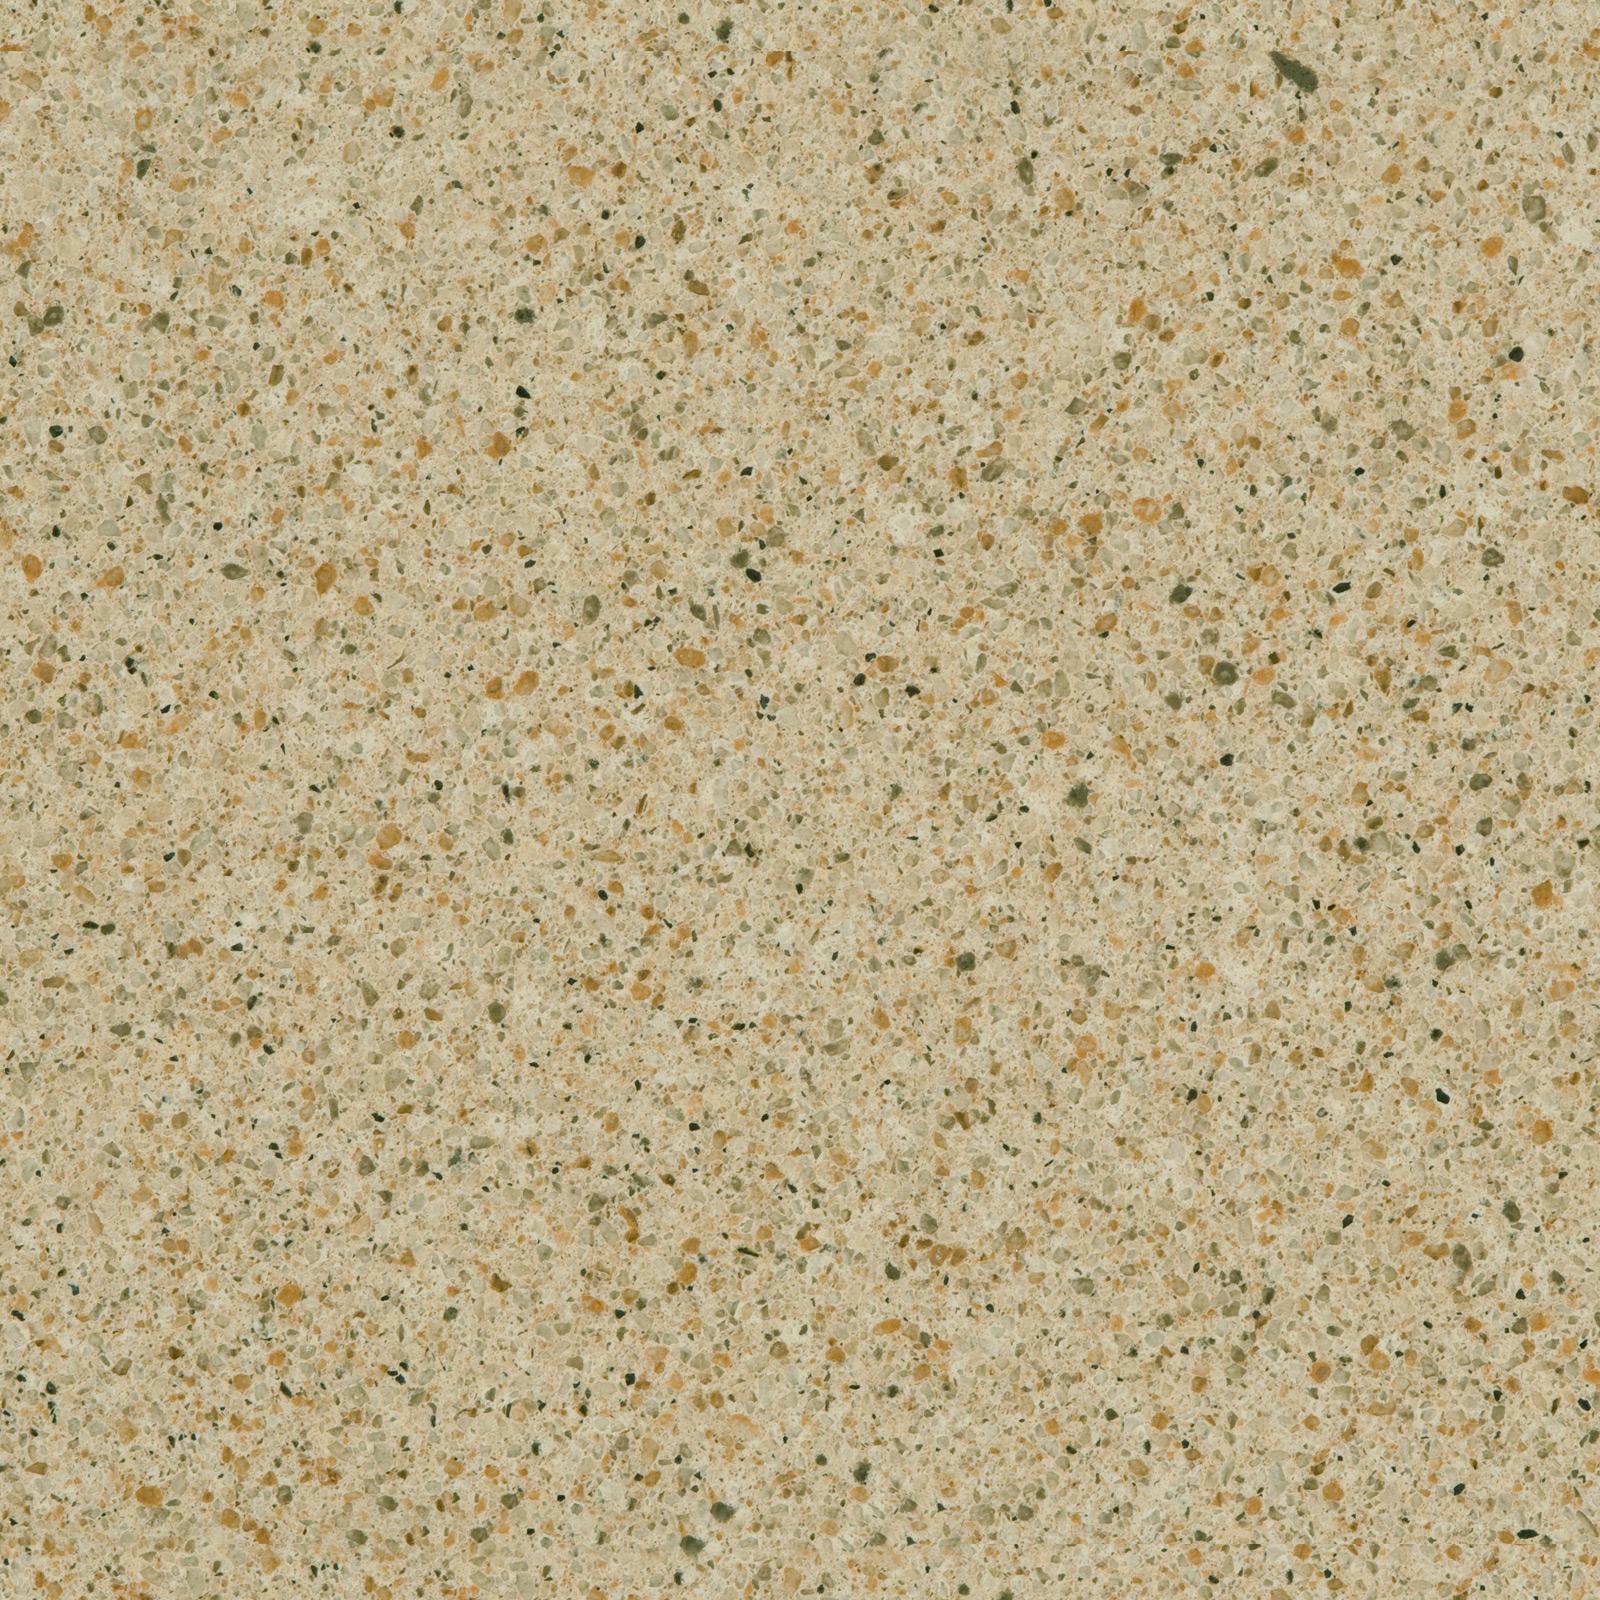 Hanstone quartz countertops for Engineered quartz countertop colors